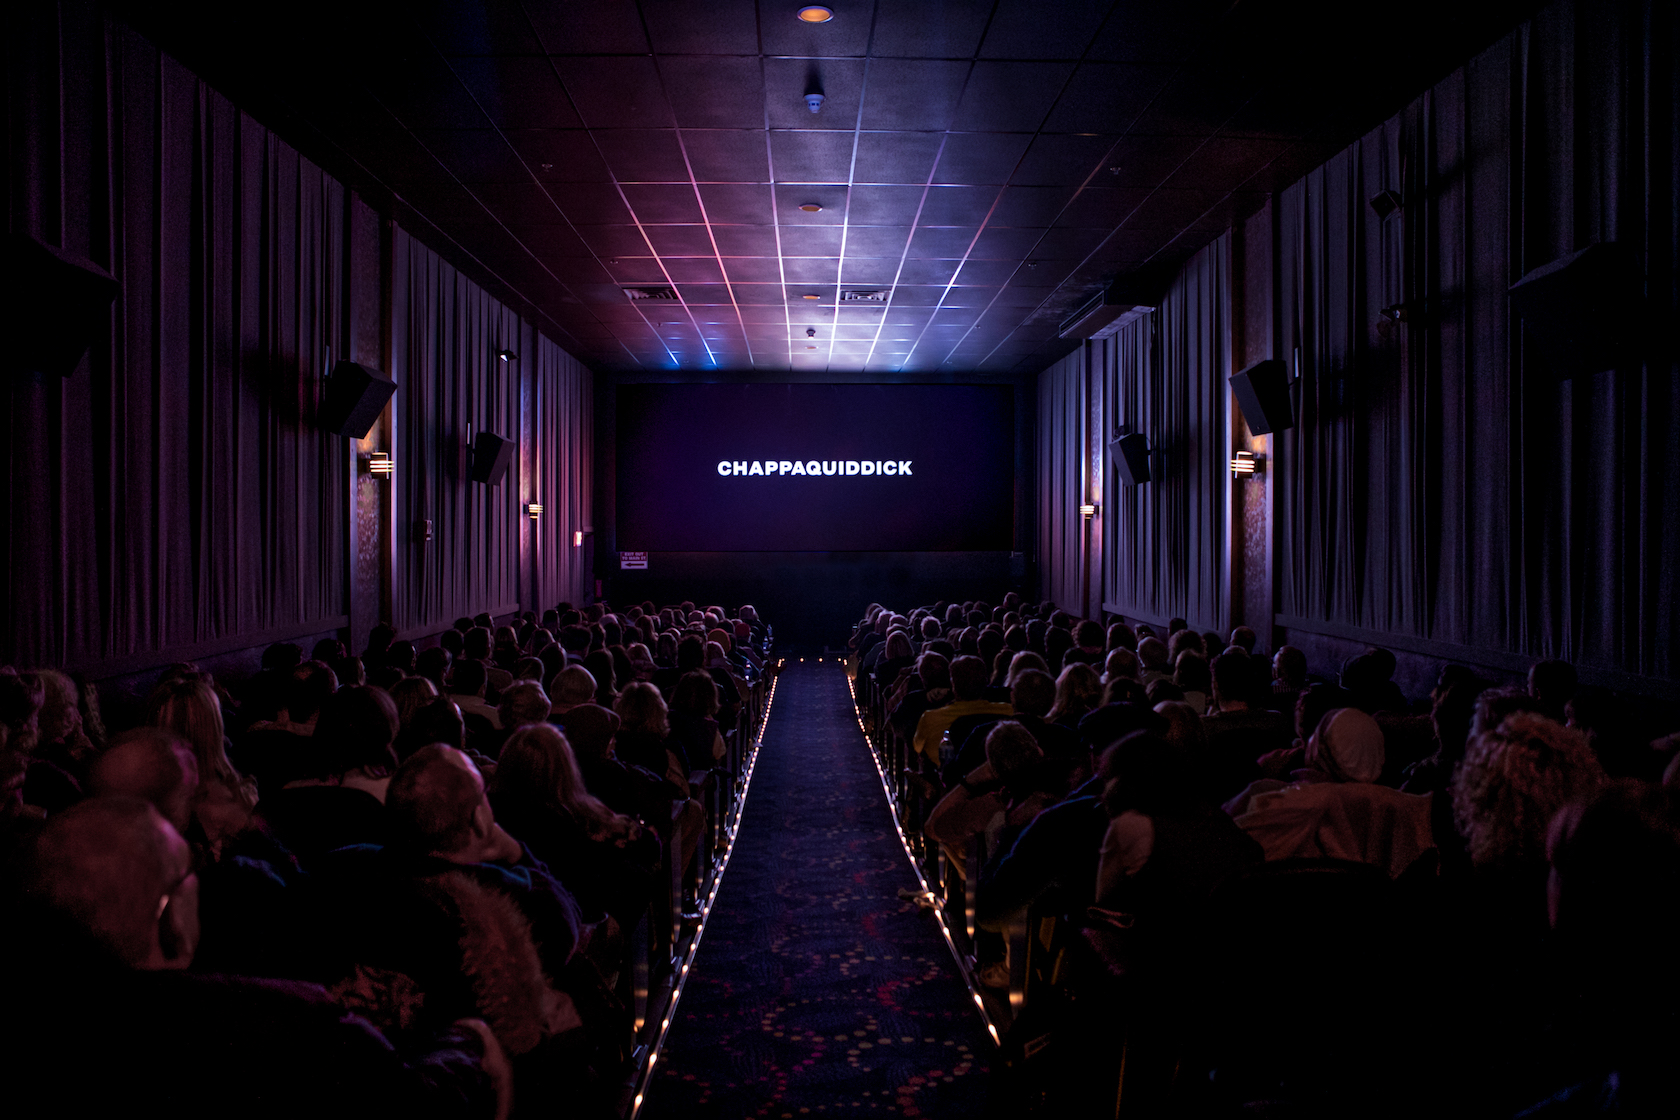 Chappaquiddick Edg Cinema- VineyardLights-1.jpg-11 copy.jpg